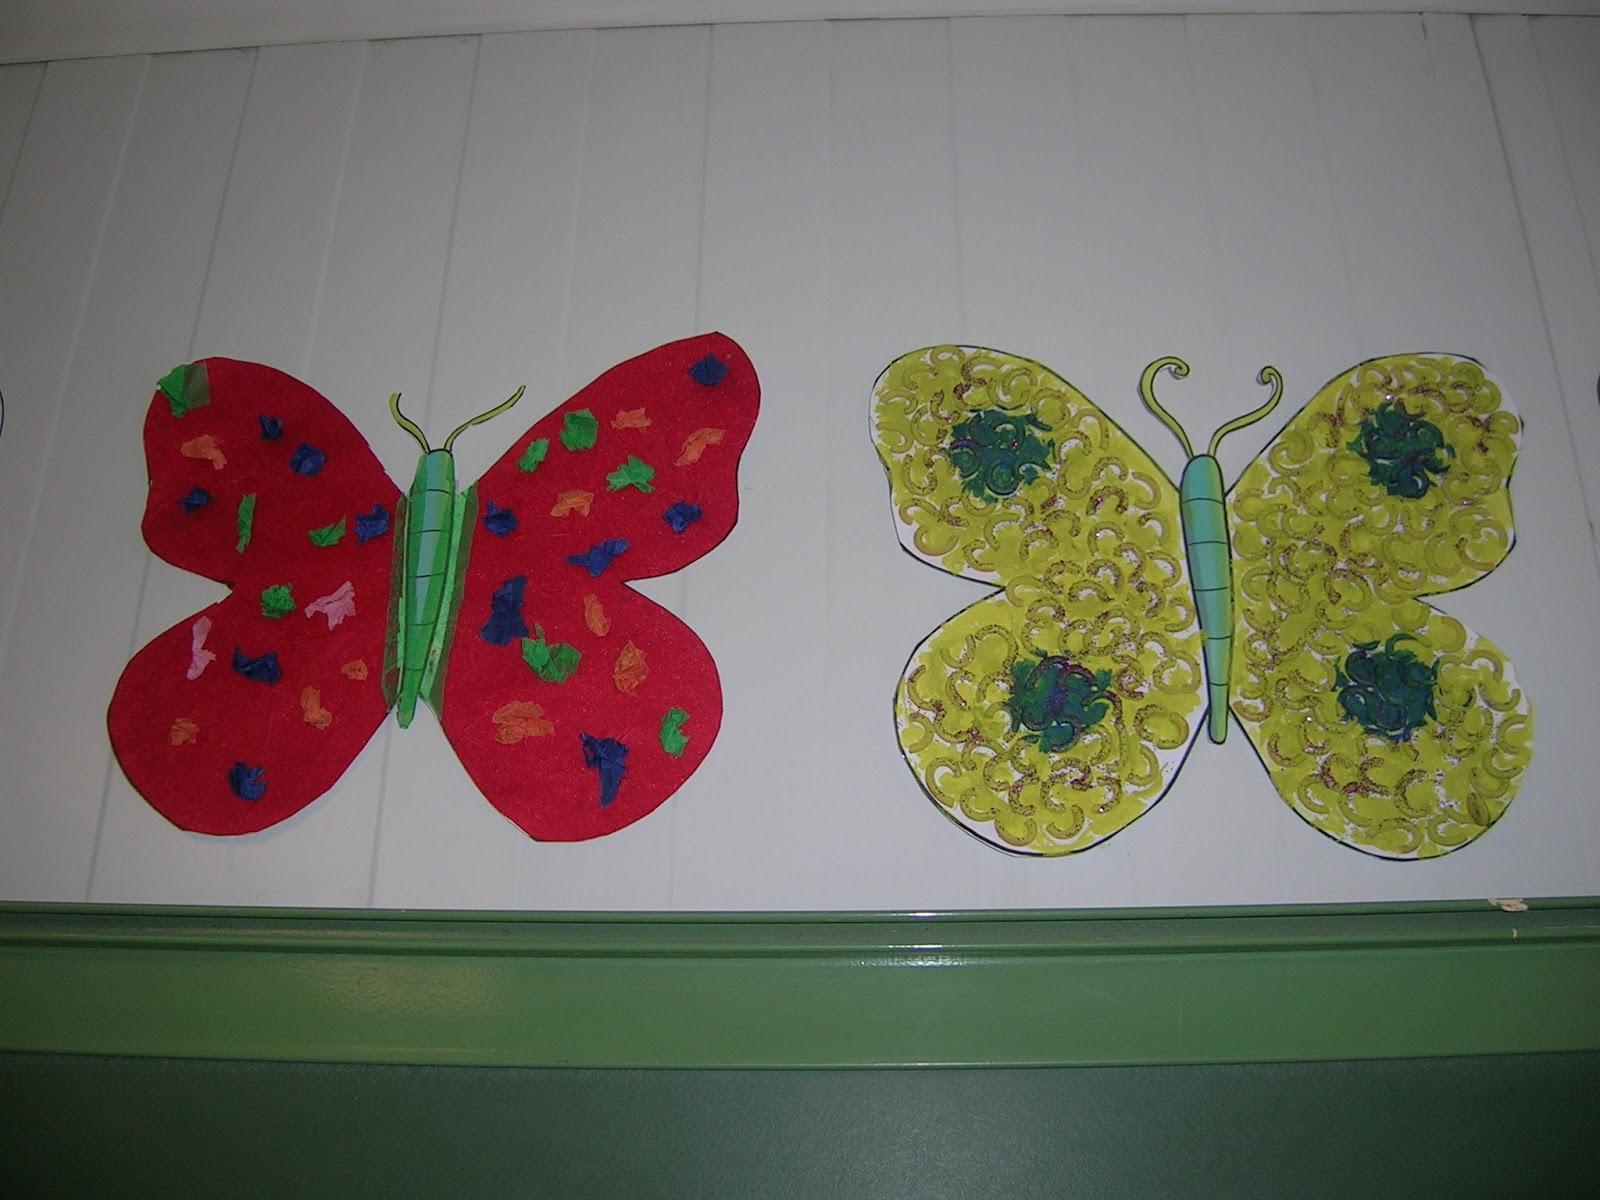 Trabajando en educaci n infantil decoraci n primavera - Decorar dibujos infantiles ...